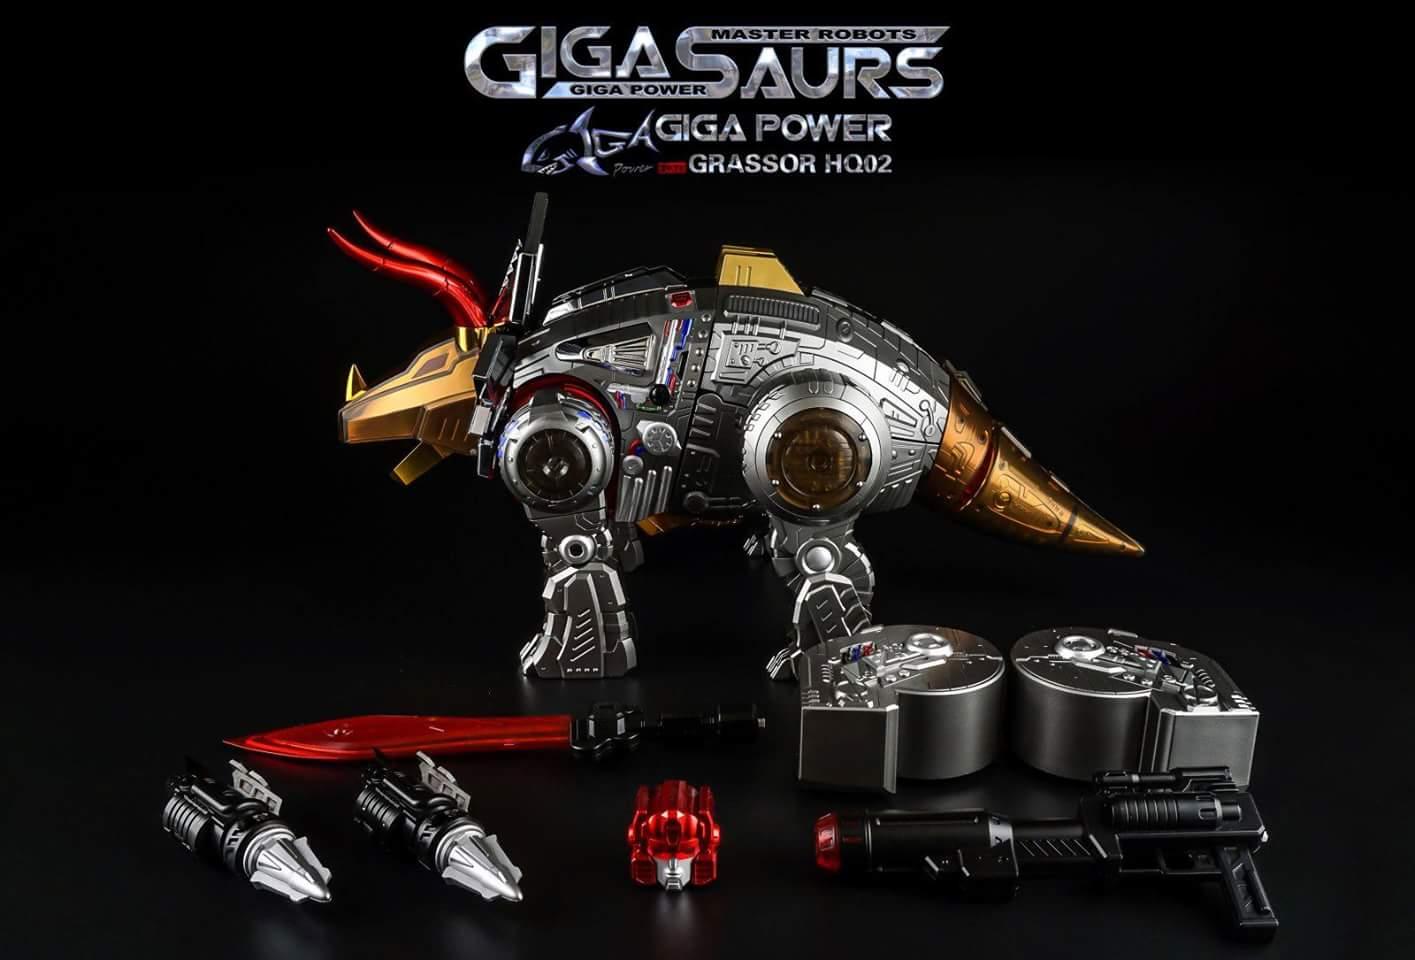 [GigaPower] Produit Tiers - Jouets HQ-01 Superator + HQ-02 Grassor + HQ-03 Guttur + HQ-04 Graviter + HQ-05 Gaudenter - aka Dinobots - Page 4 VBzmJ4xM